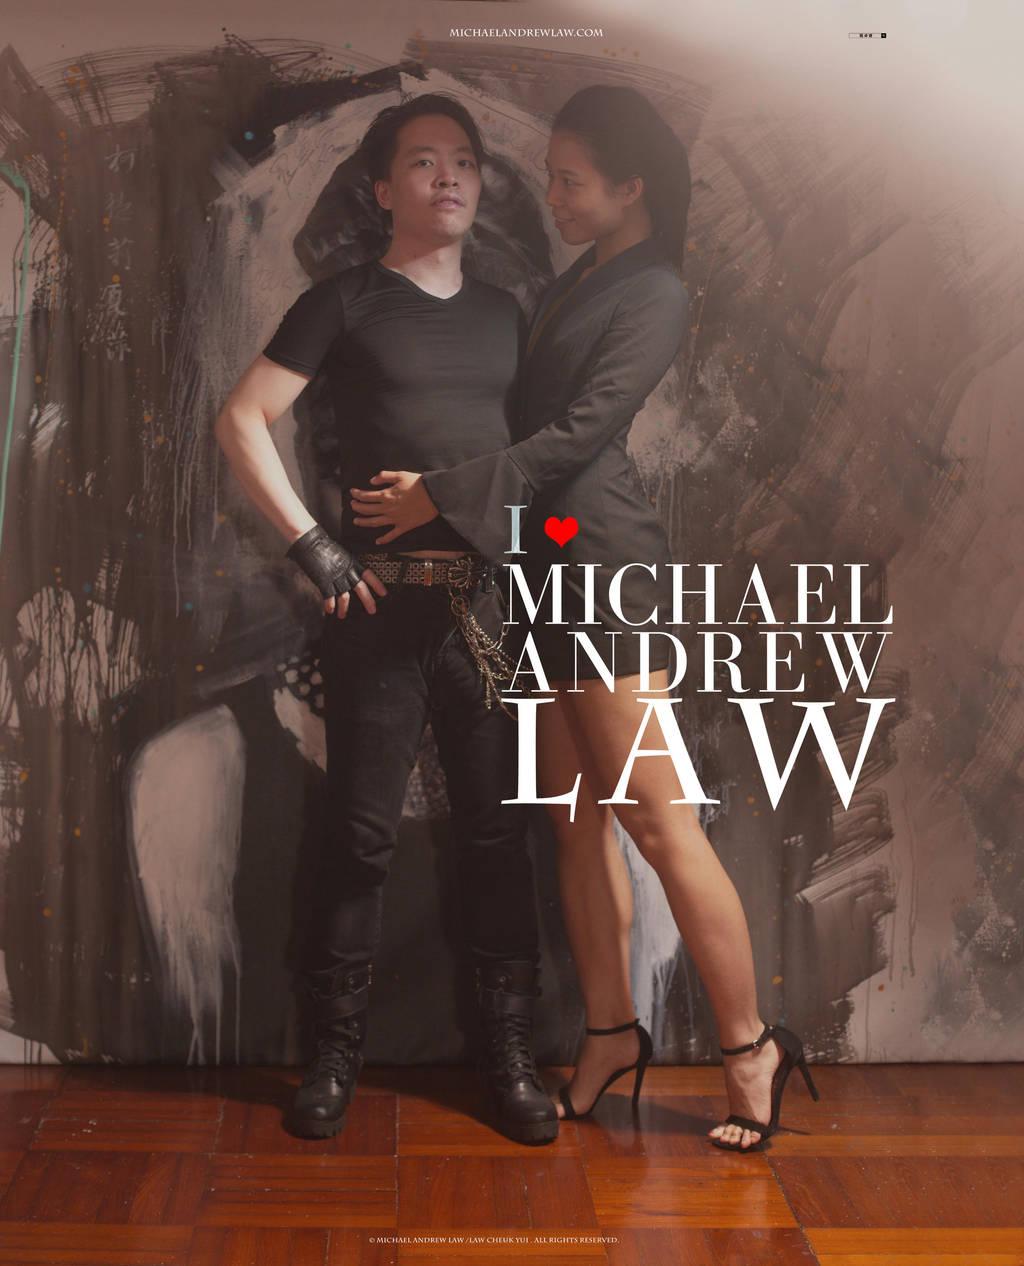 Michael Andrew Law Cheuk Yui Ad Art Series by michaelandrewlaw